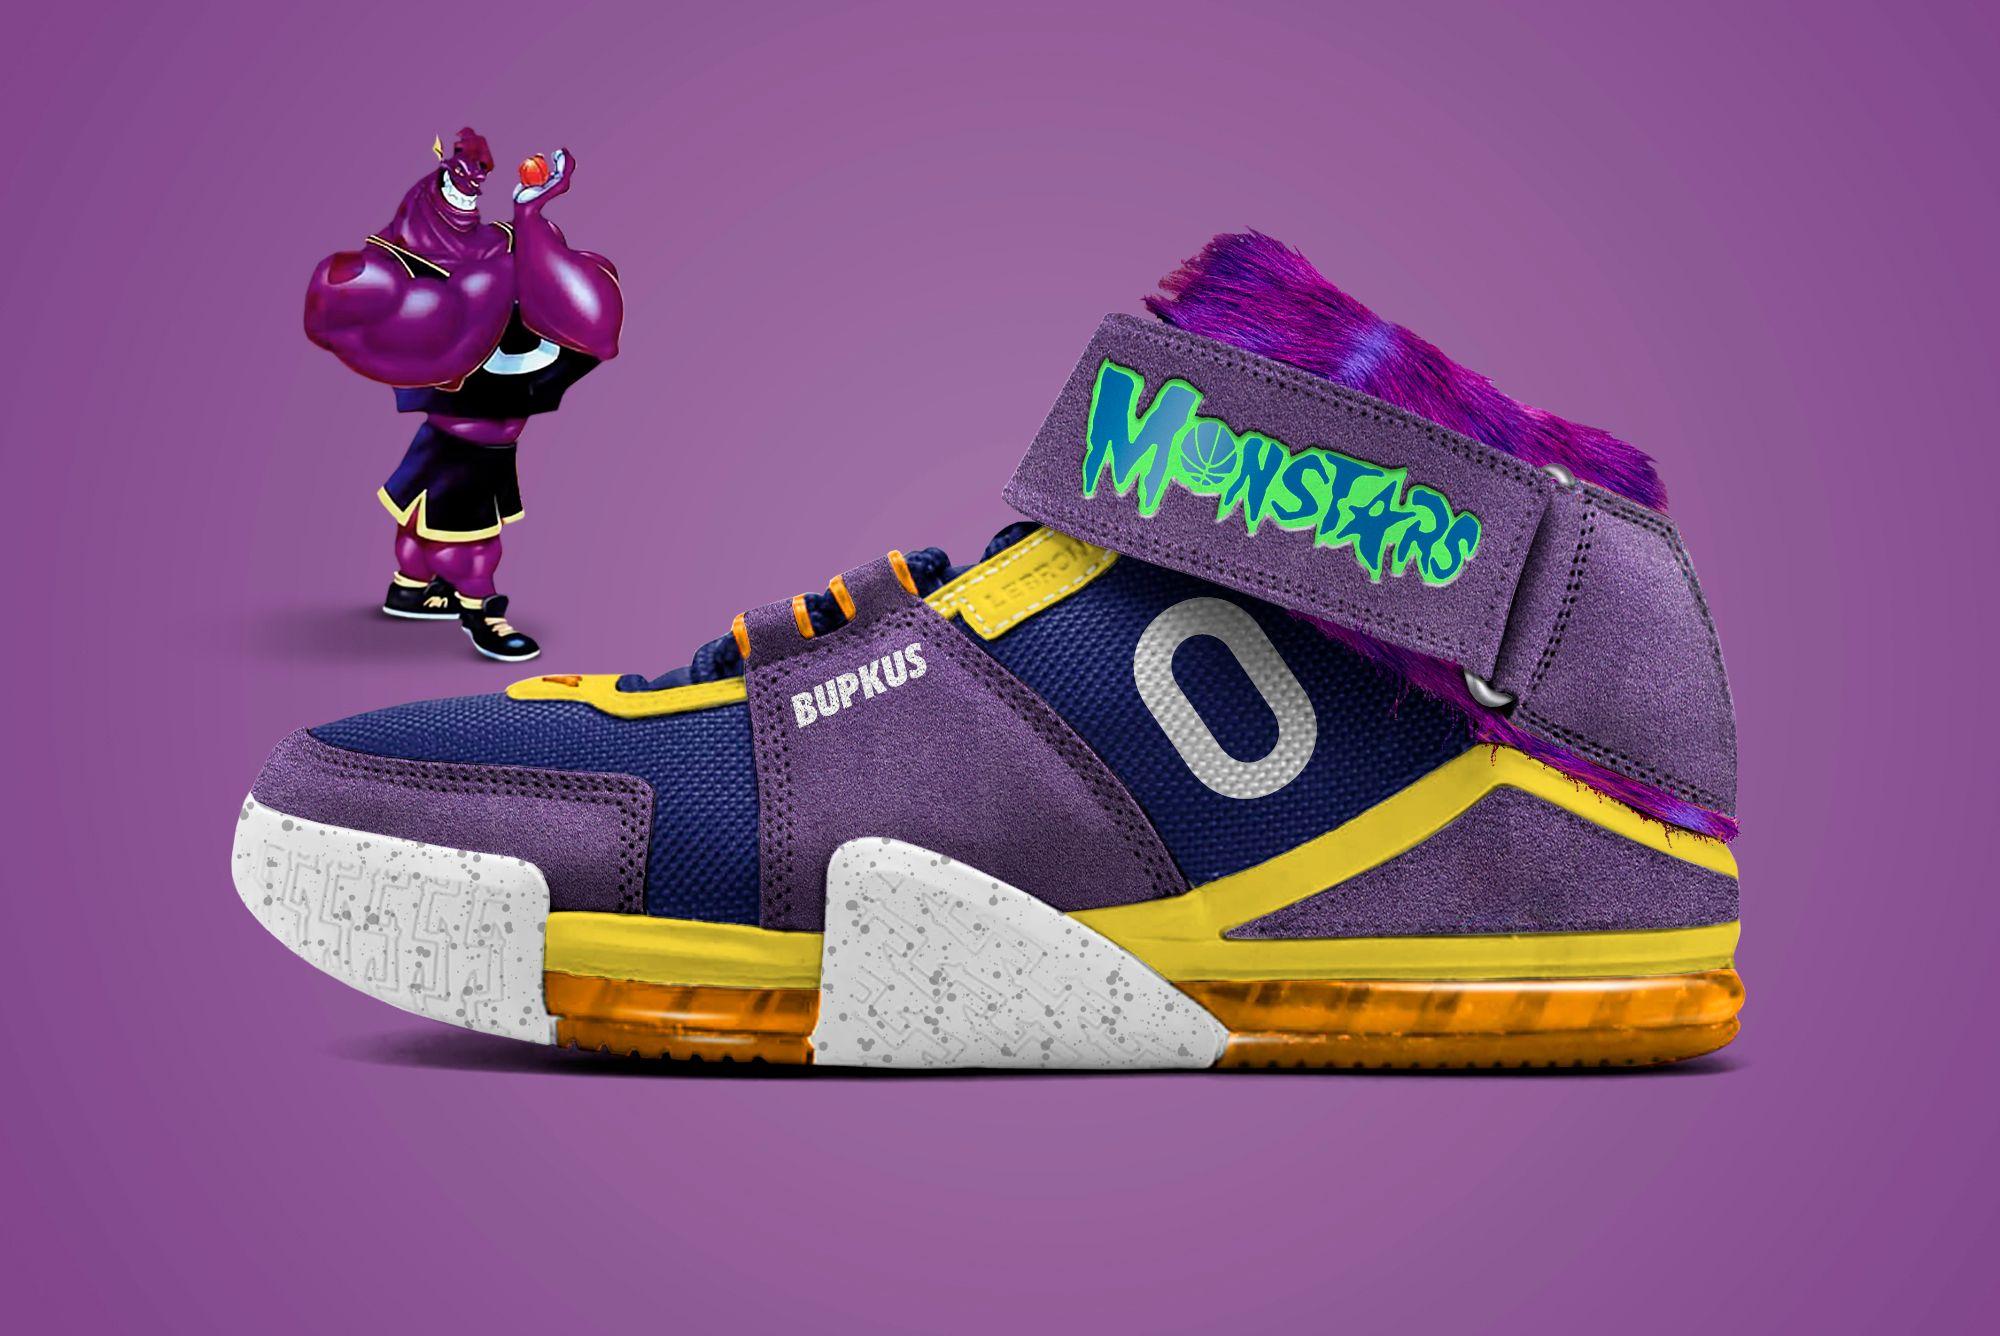 Nike LeBron 2 'Monstars: Bupkus'